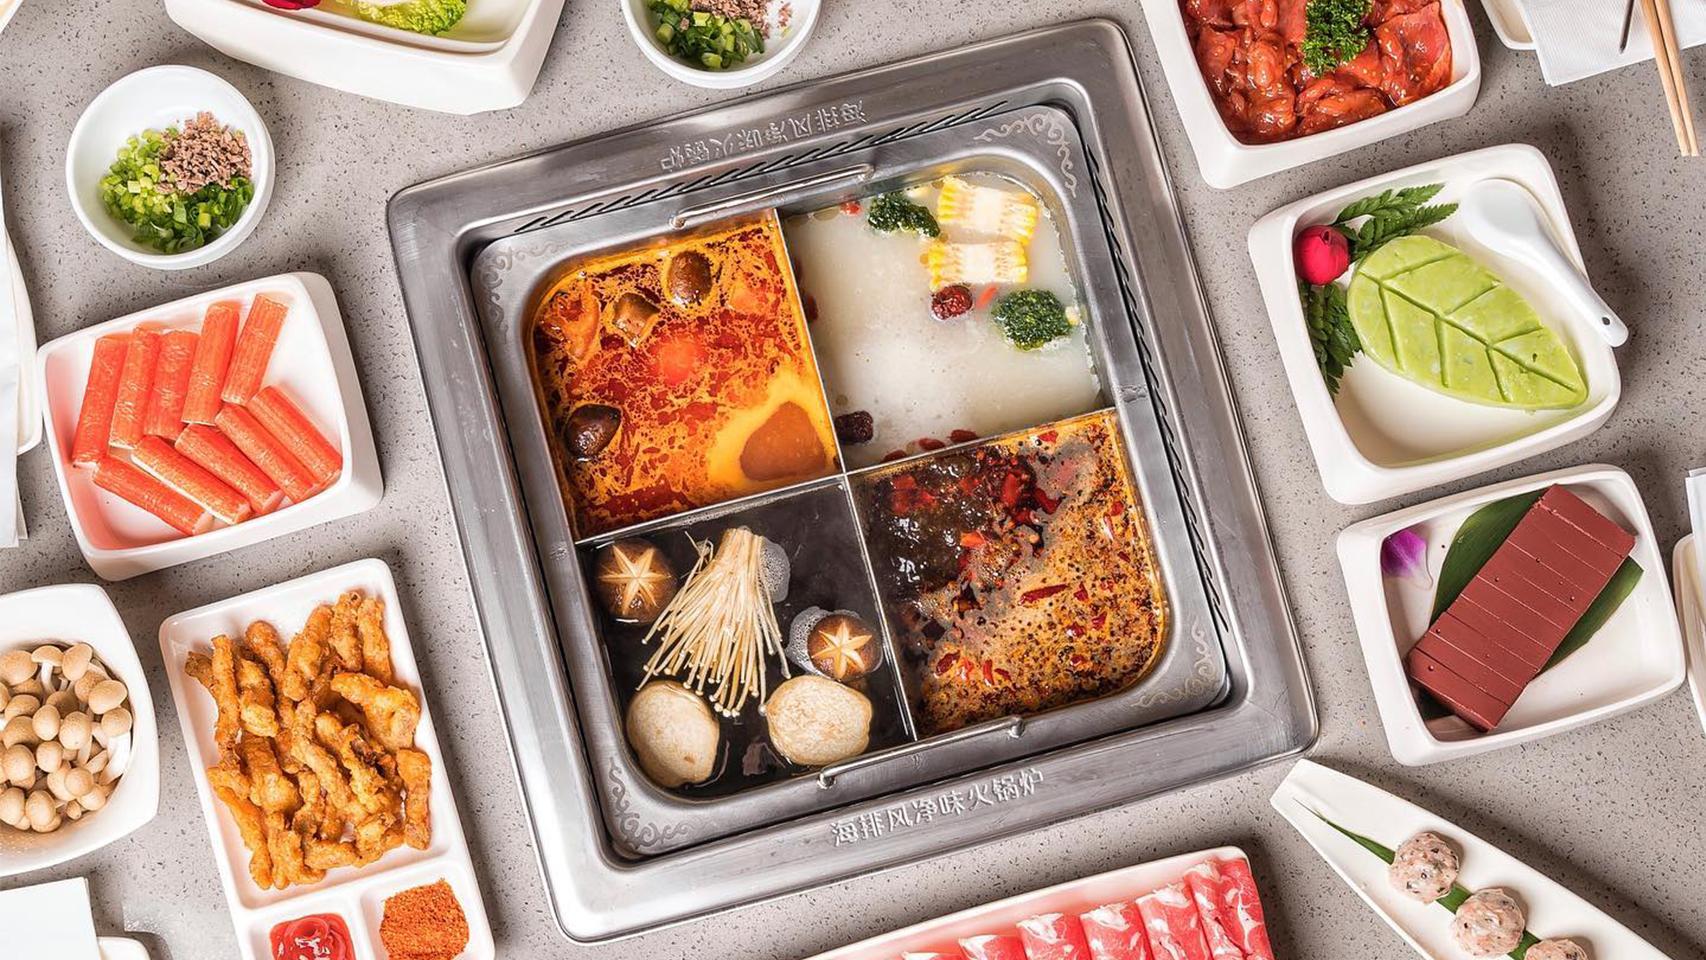 Haidilao - China's top hotpot chain